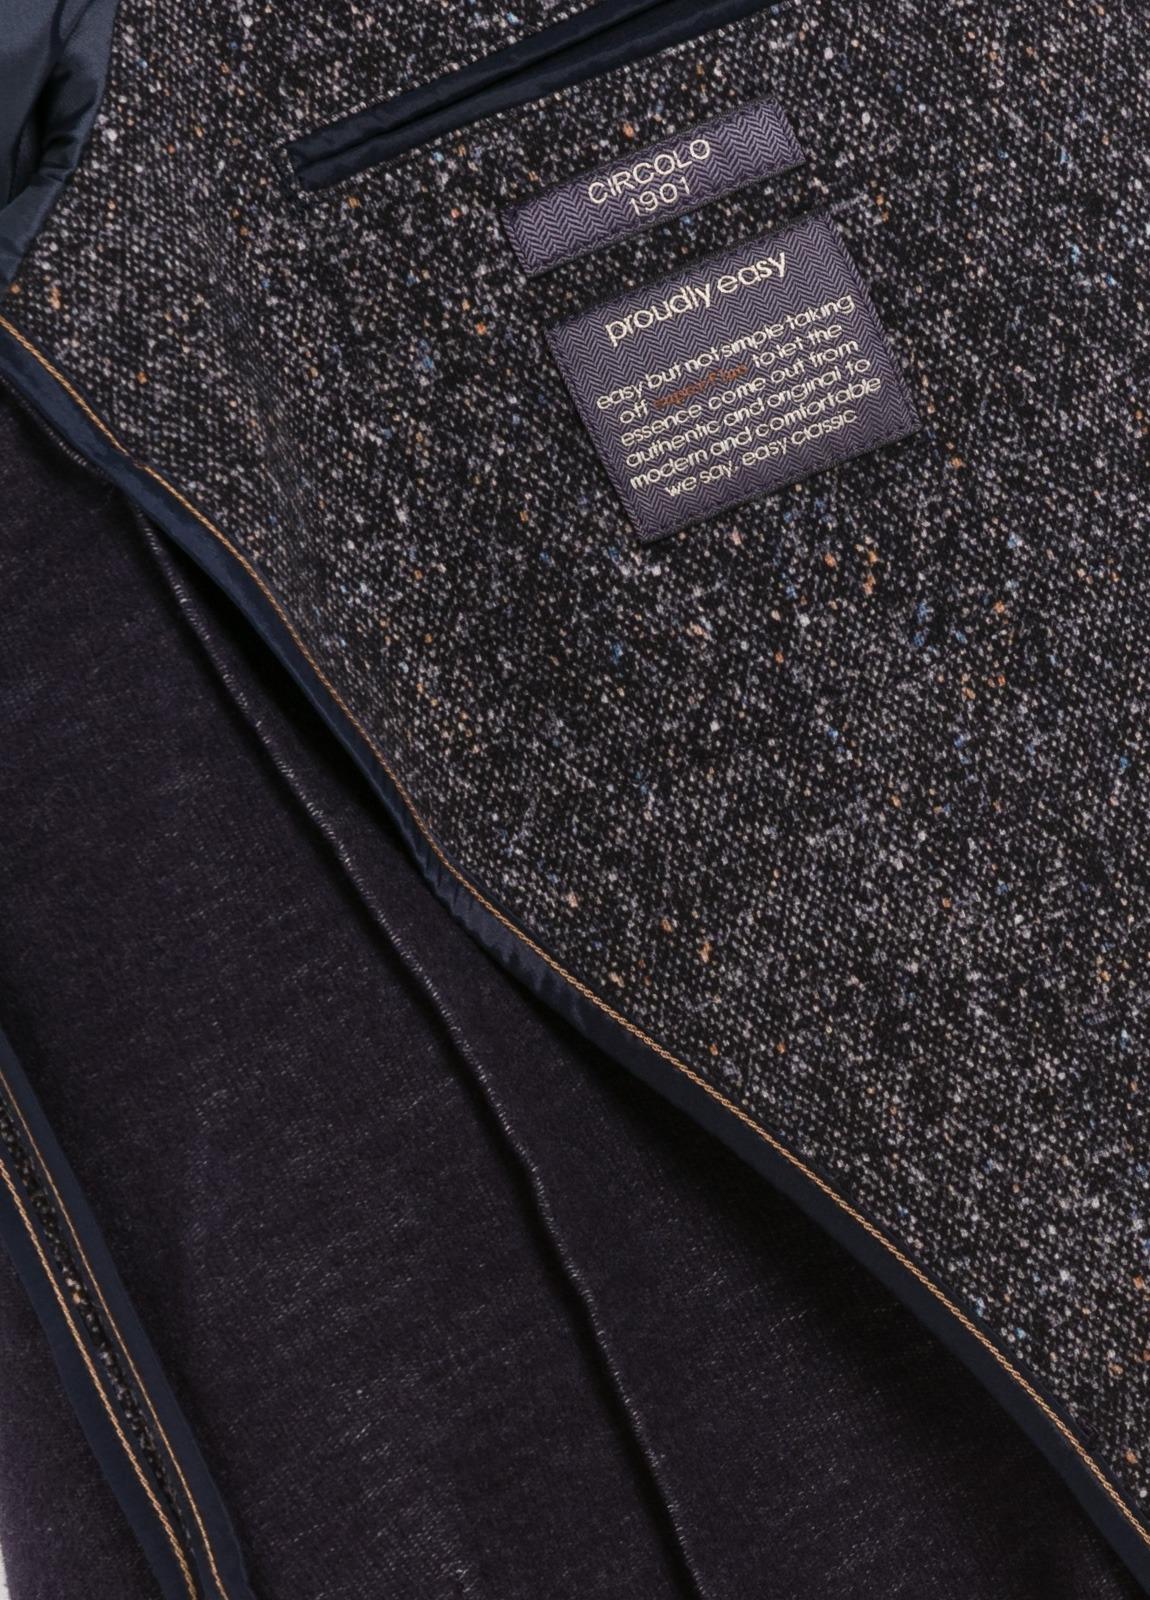 Americana soft 2 botones SLIM FIT Oxford color azul marino, 95% Algodón 5% Ea. - Ítem1